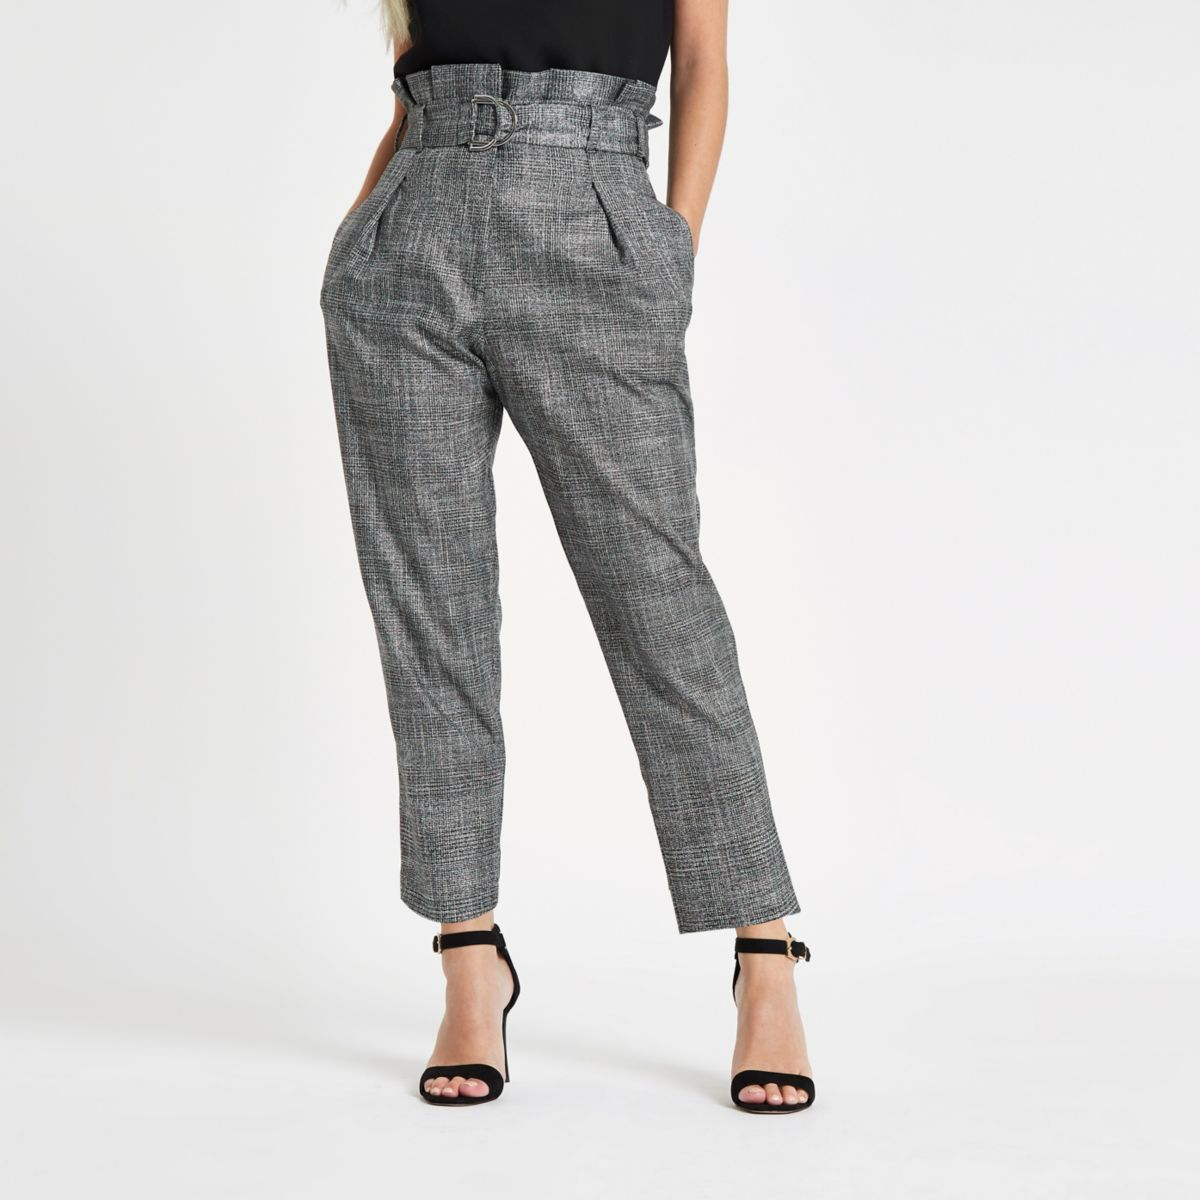 Petite grey check paperbag tapered pants